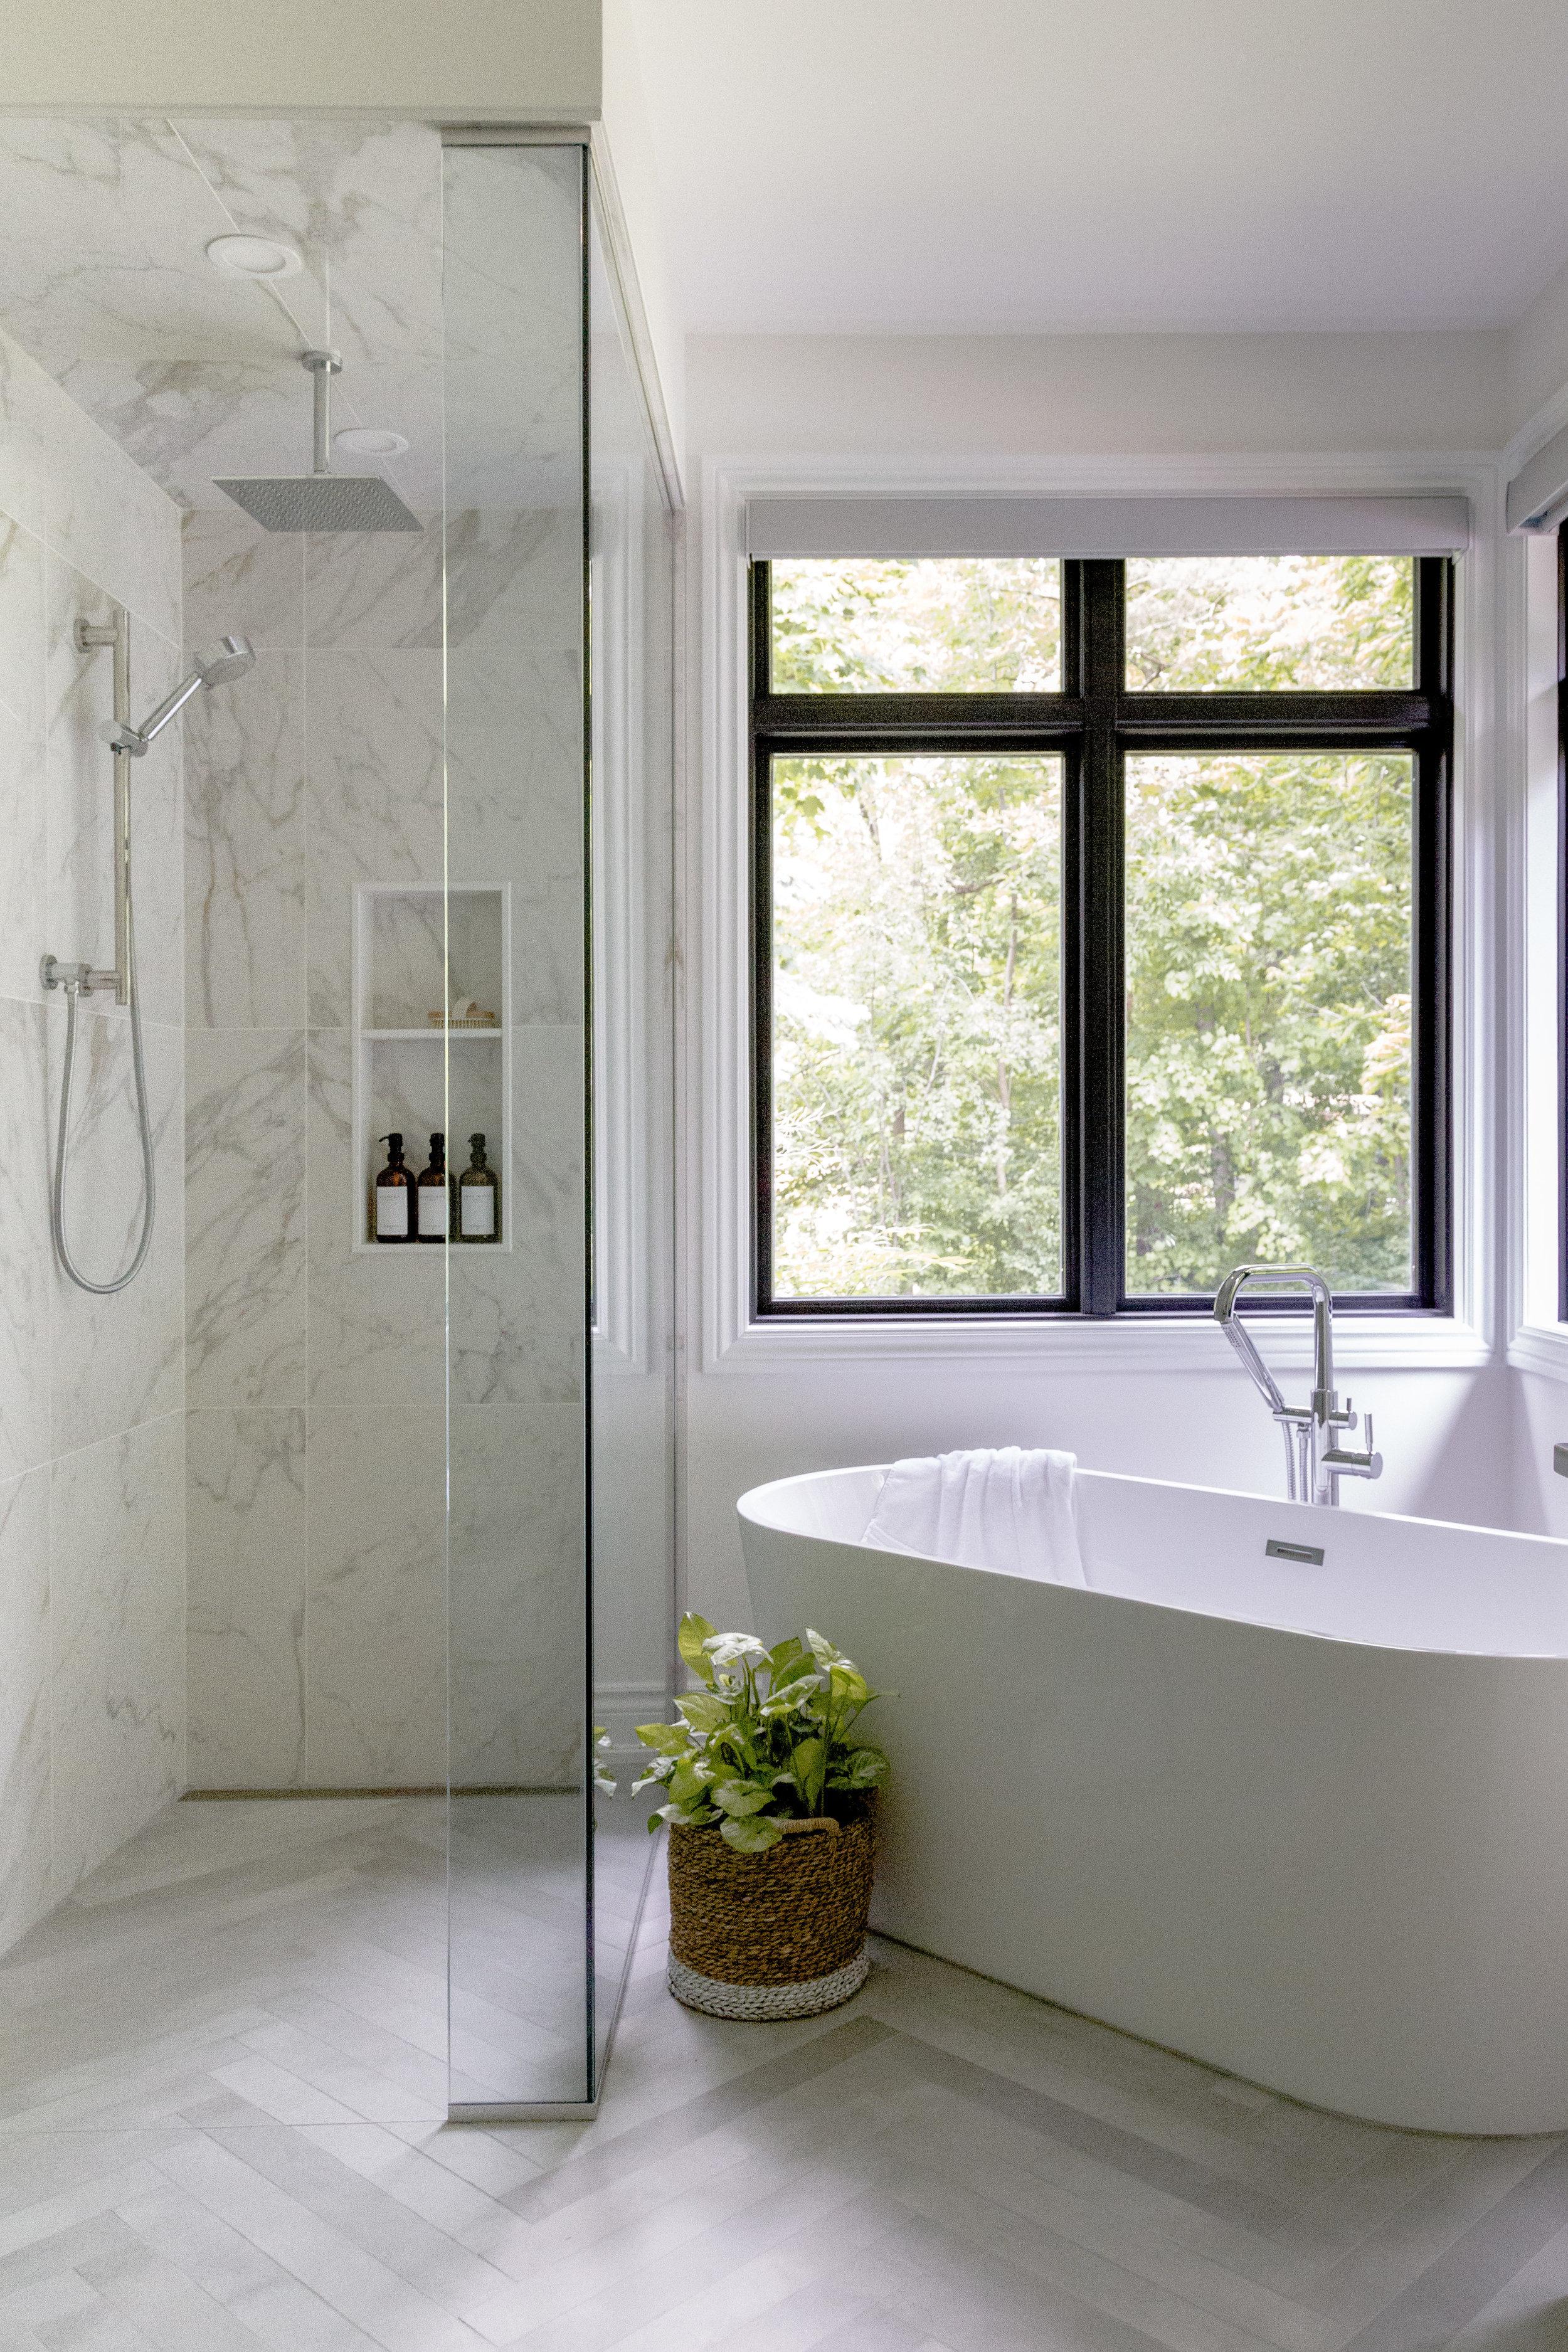 Guelph Bathroom Renovations - Walkerbrae Reno